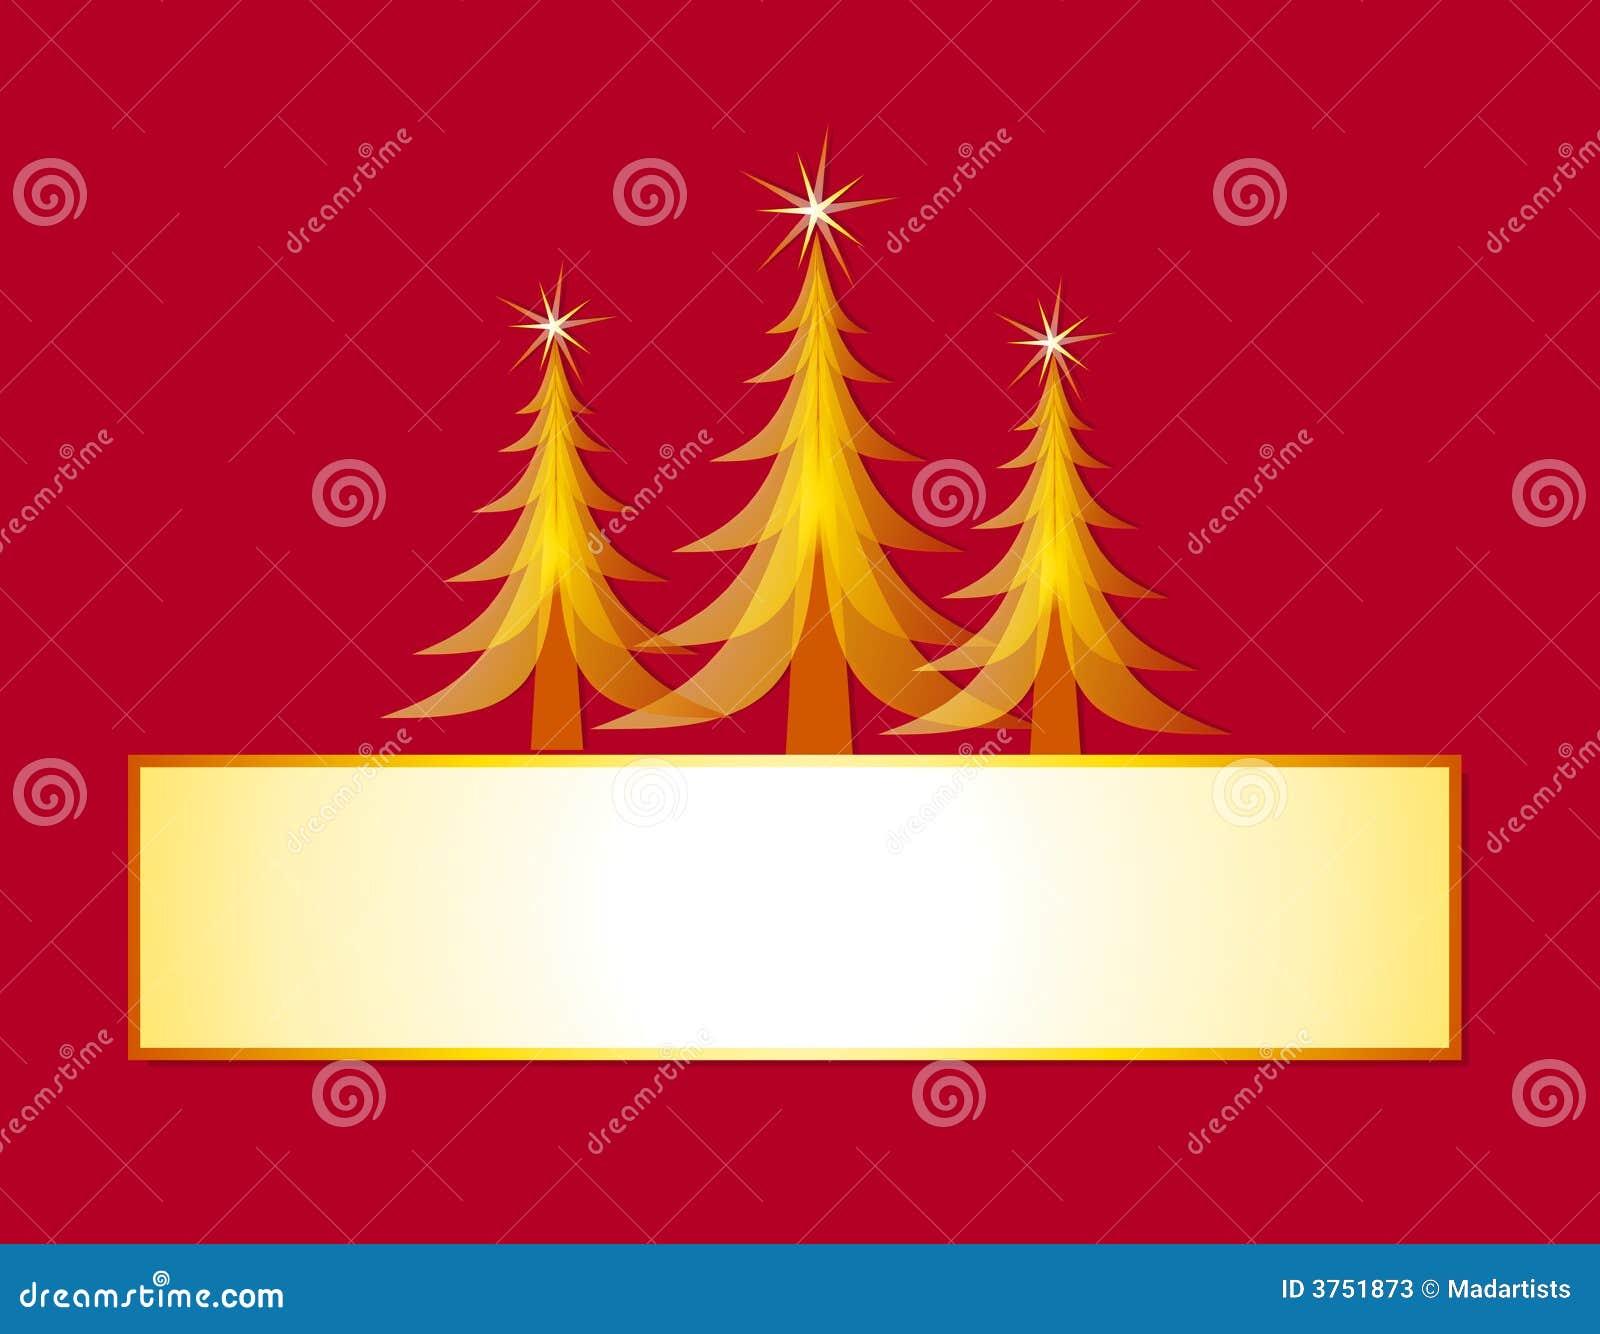 Blank Christmas Card With Trees Photos Image 3751873 – Blank Xmas Cards